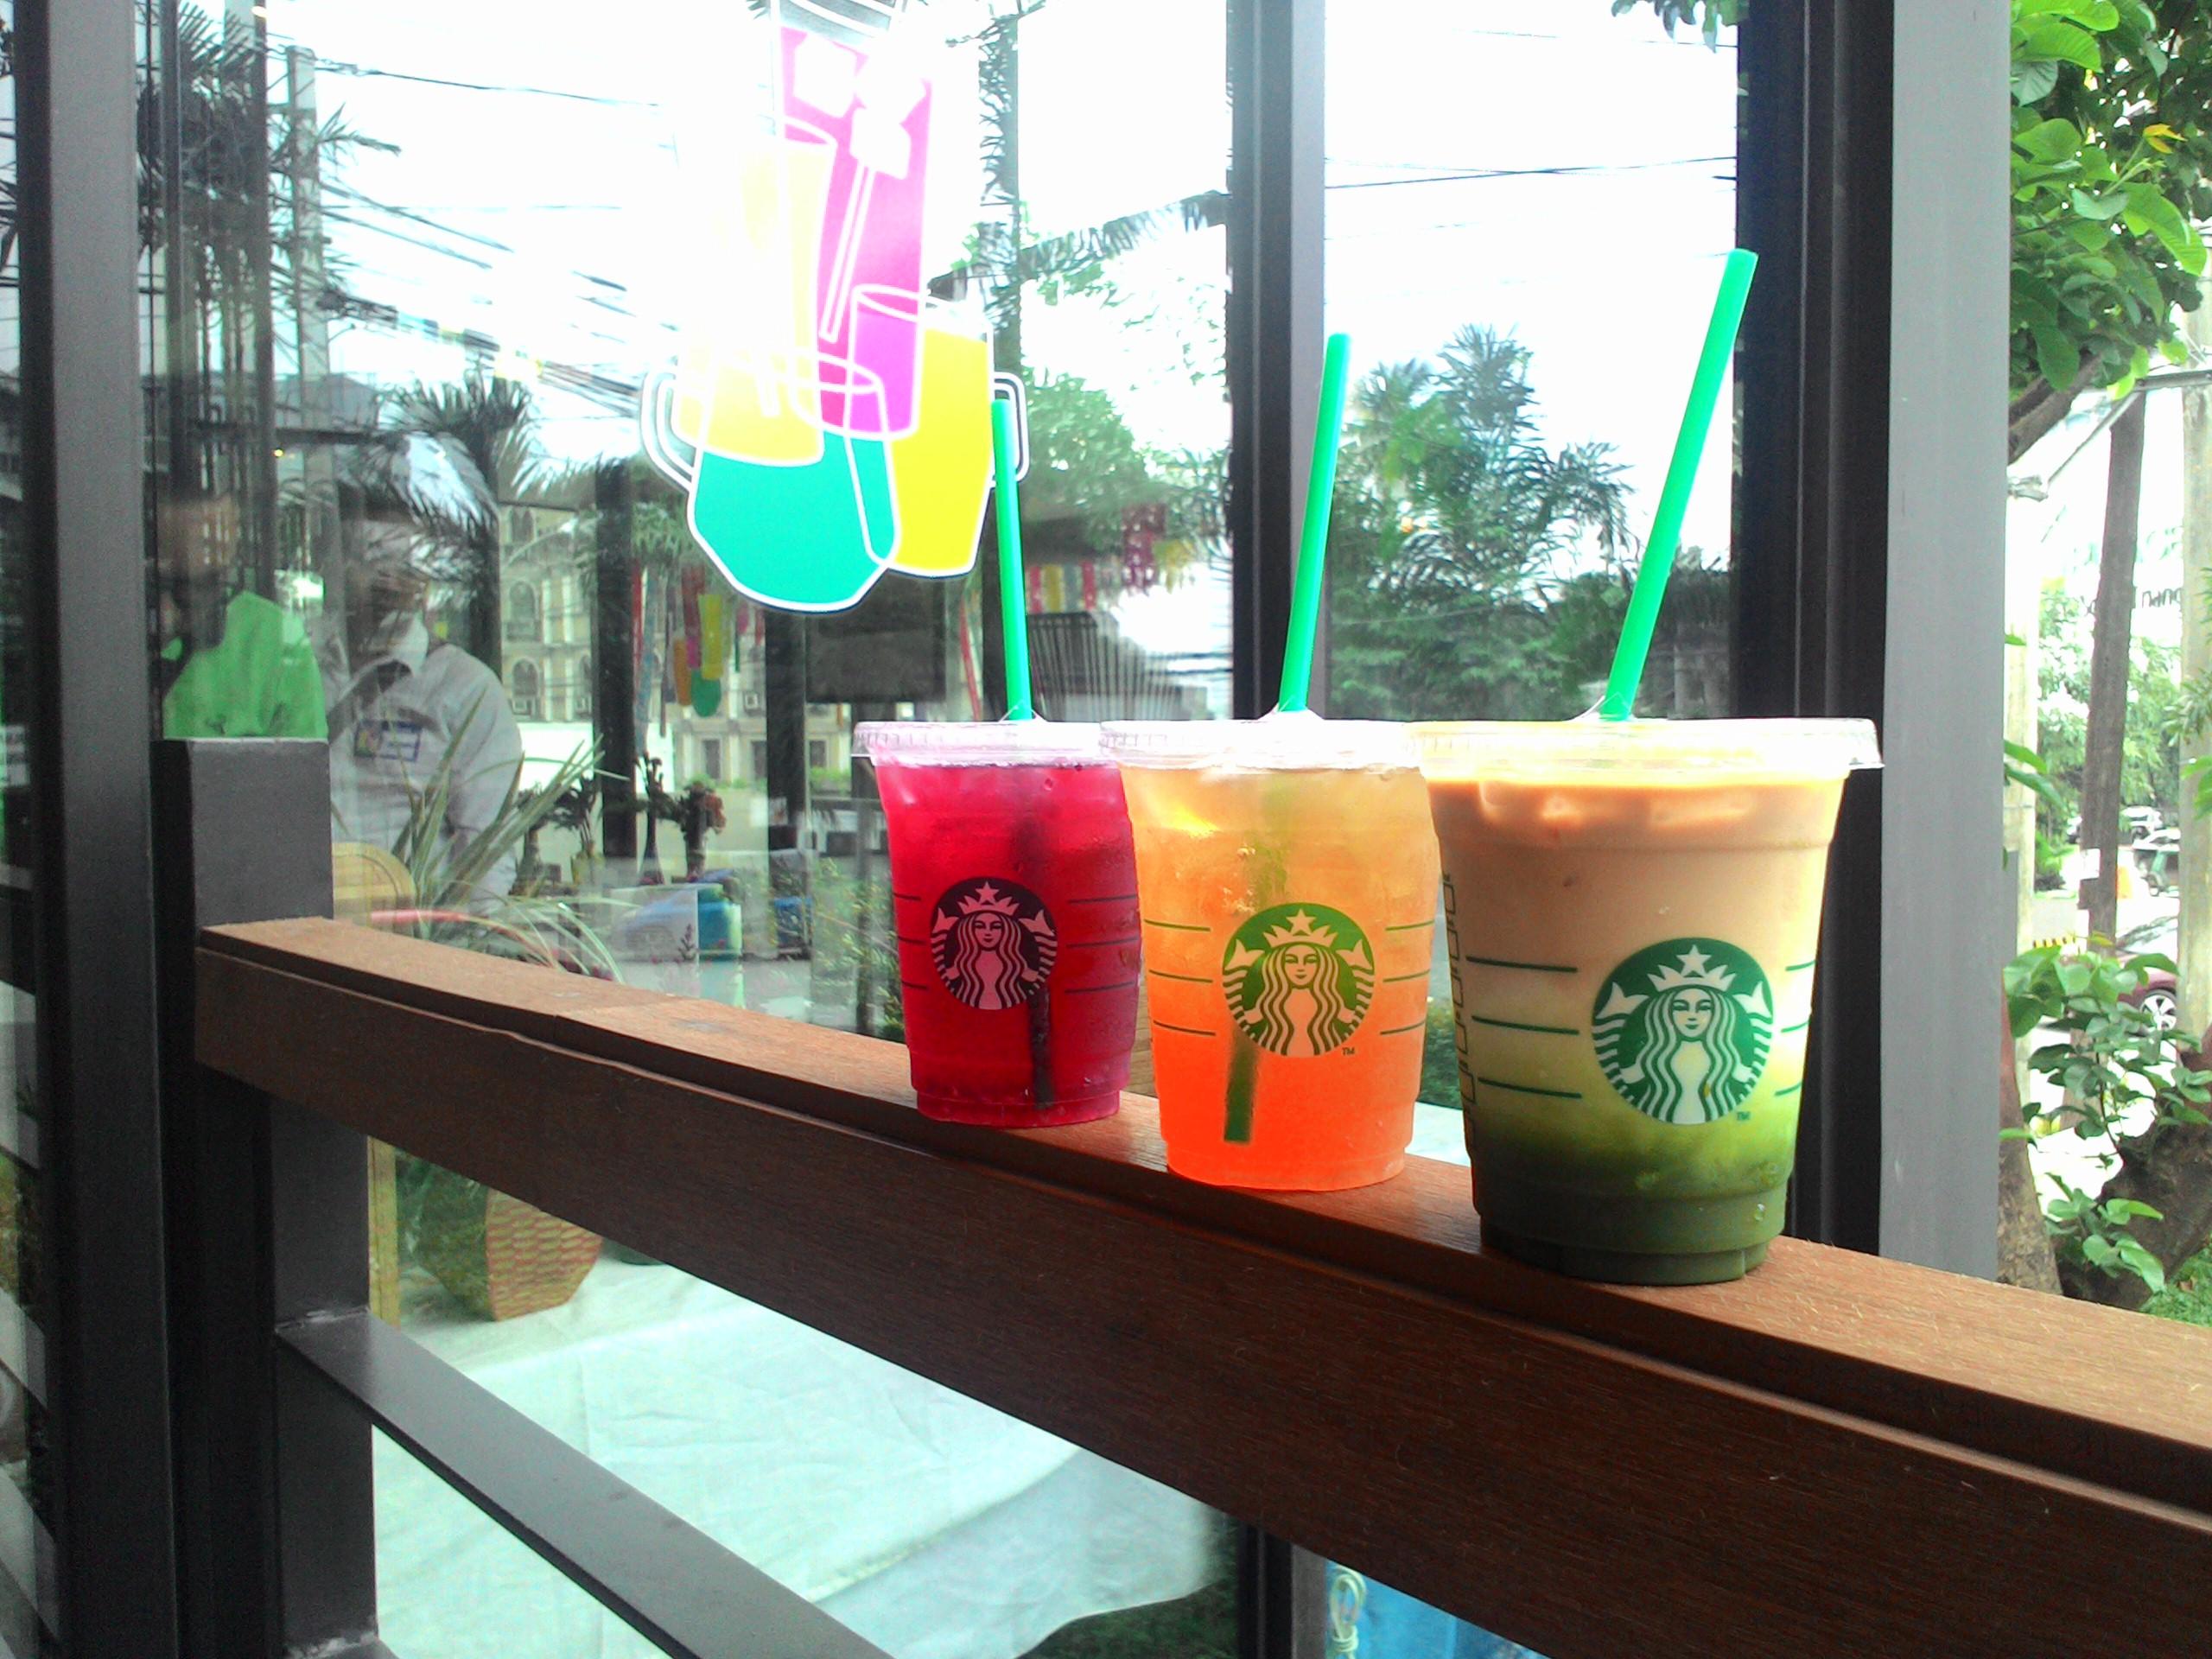 Starbucks Teavana Handcrafted Beverages